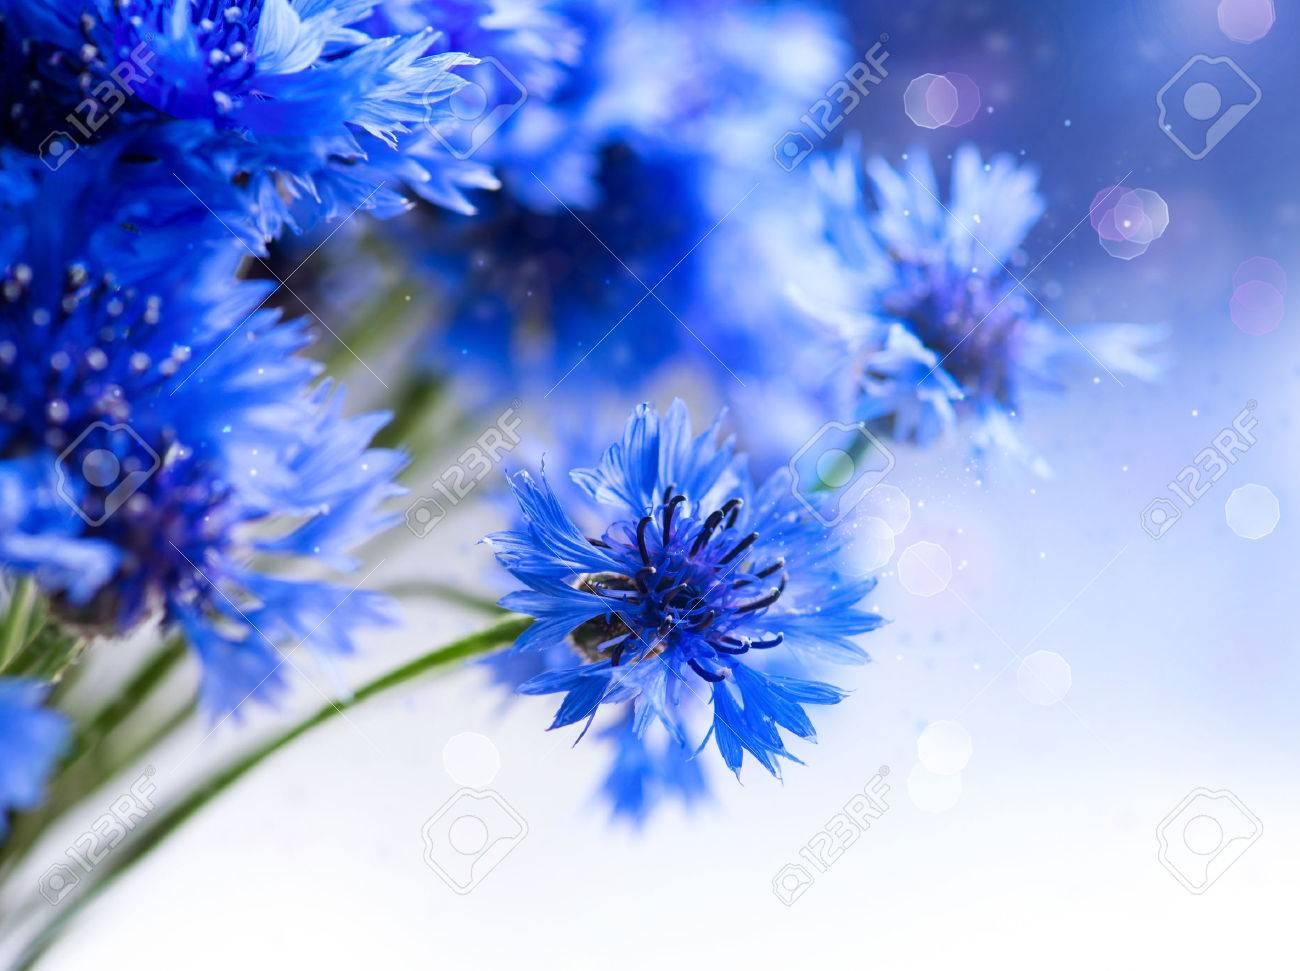 Cornflowers Wild Blue Flowers Blooming Border Art Design Stock Photo ...